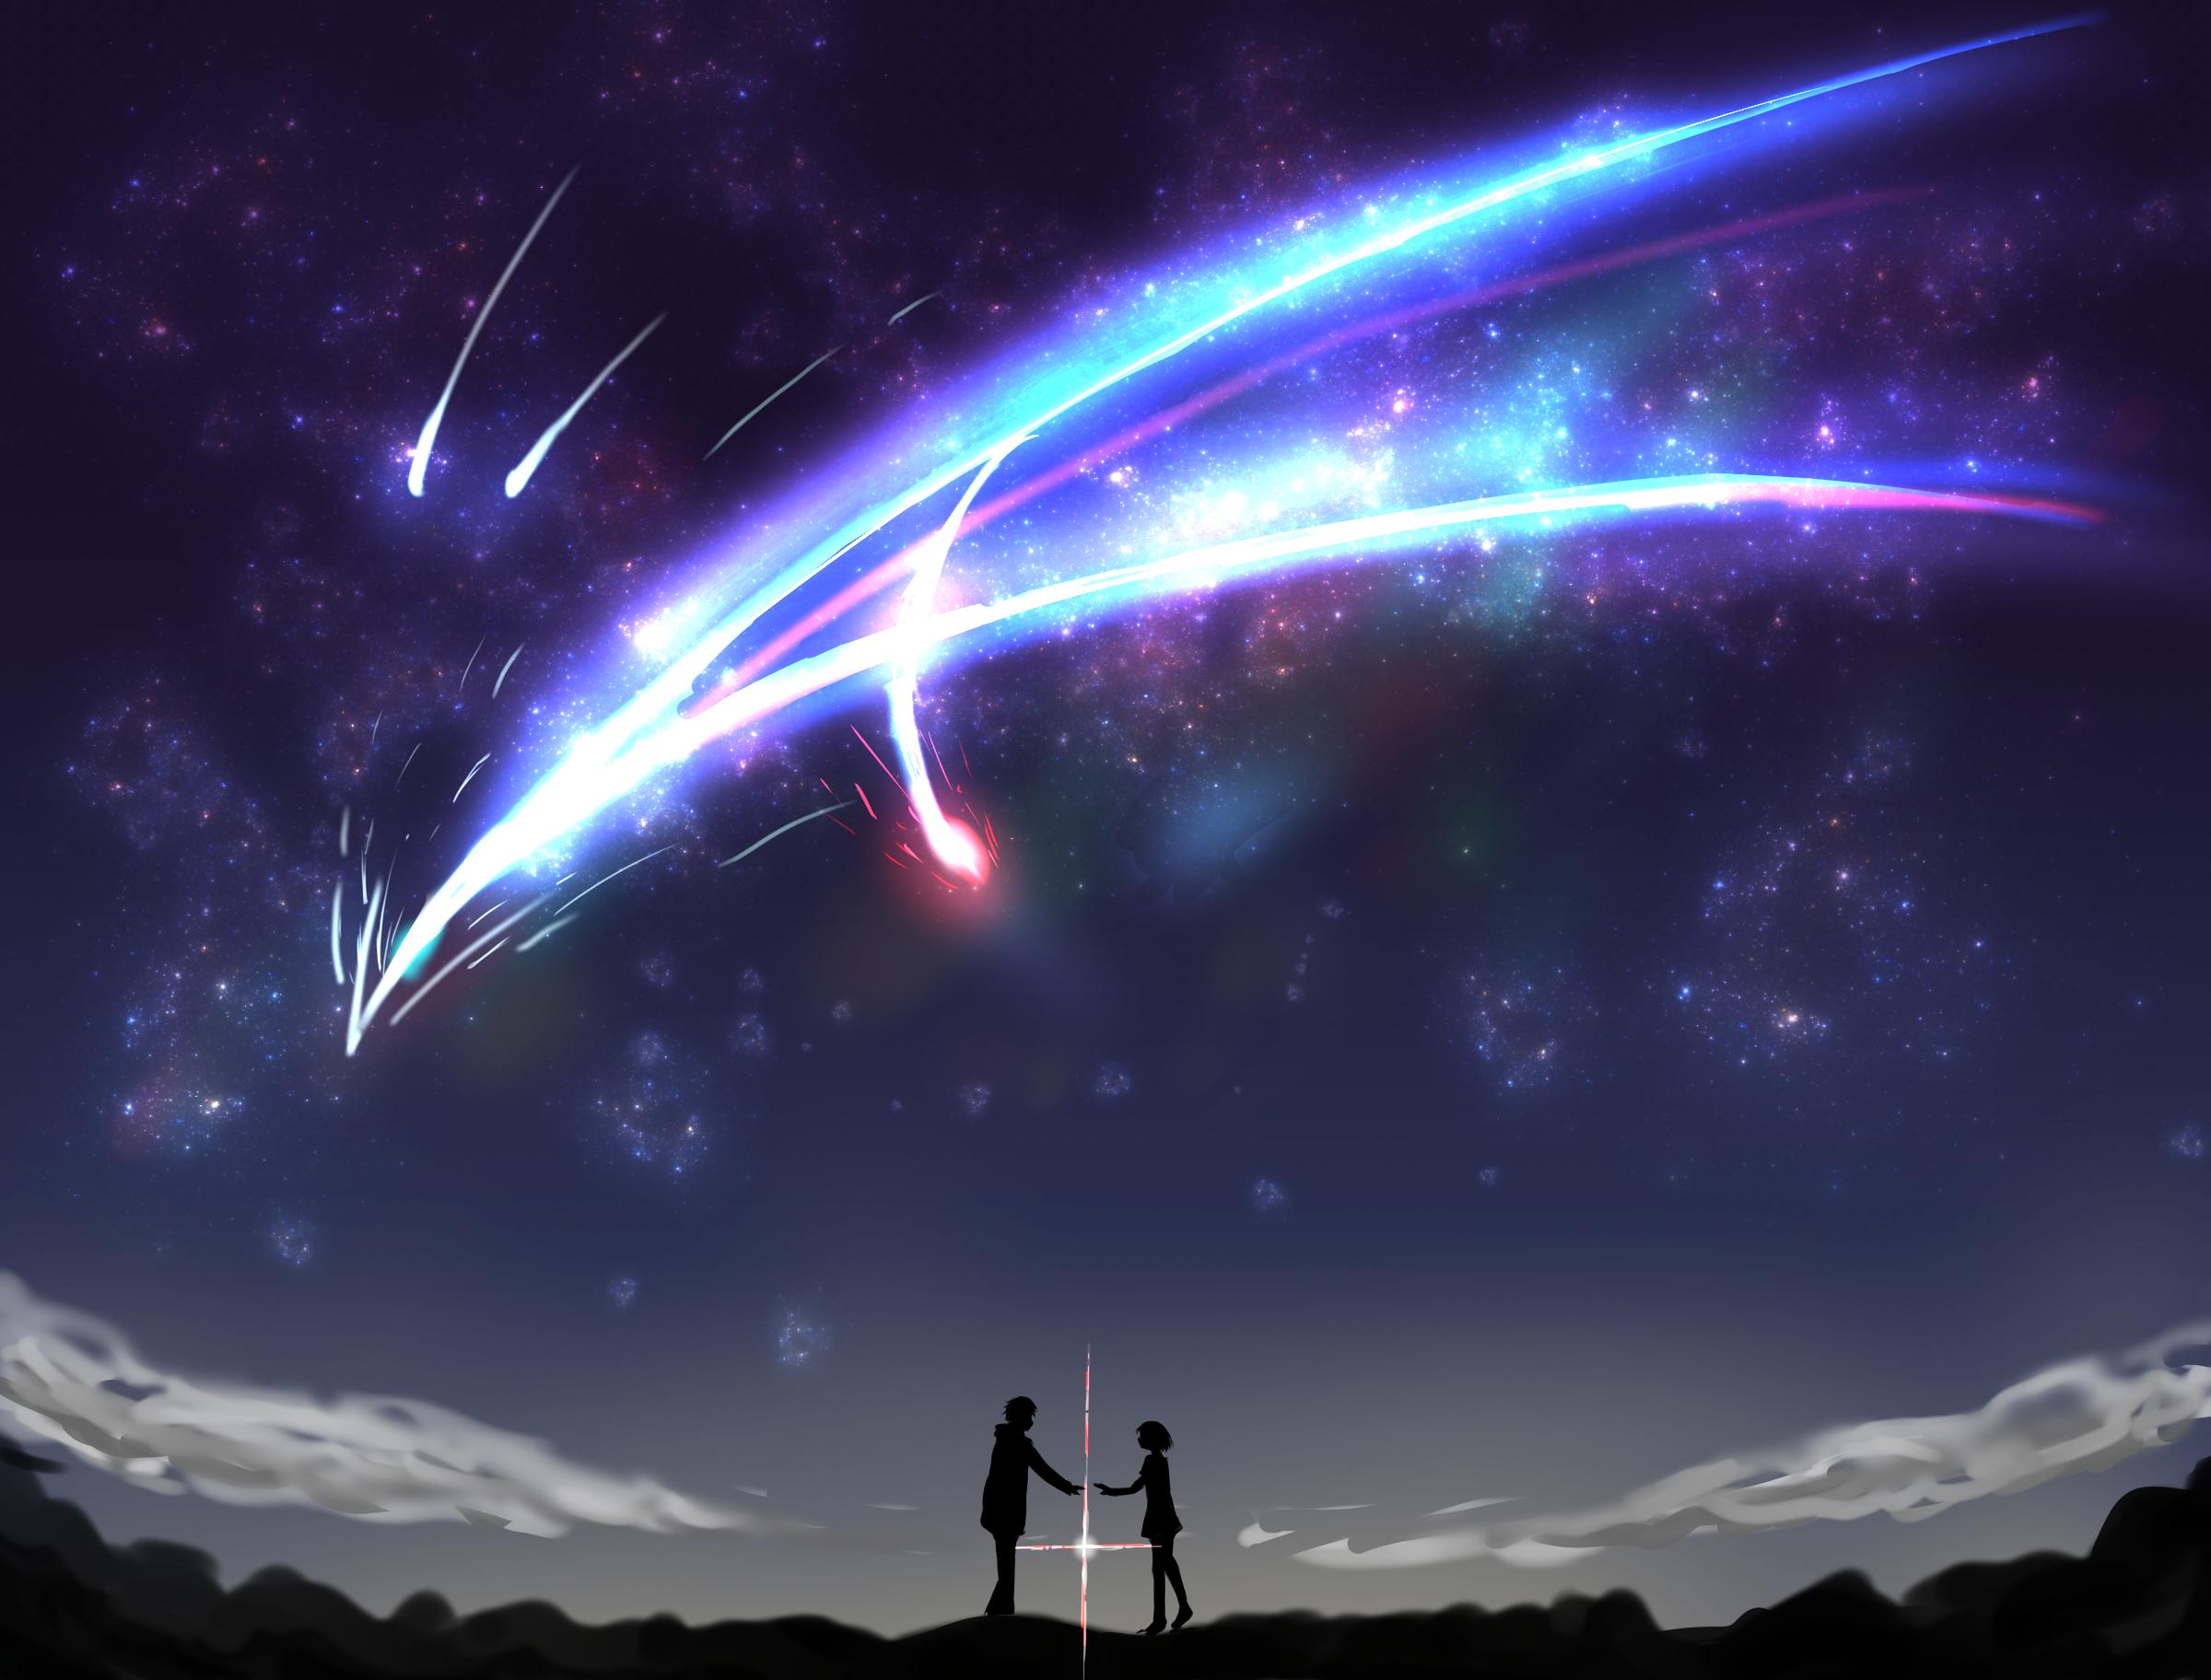 Your name | anime | Kimi no na wa wallpaper, Name wallpaper e Kimi no na wa